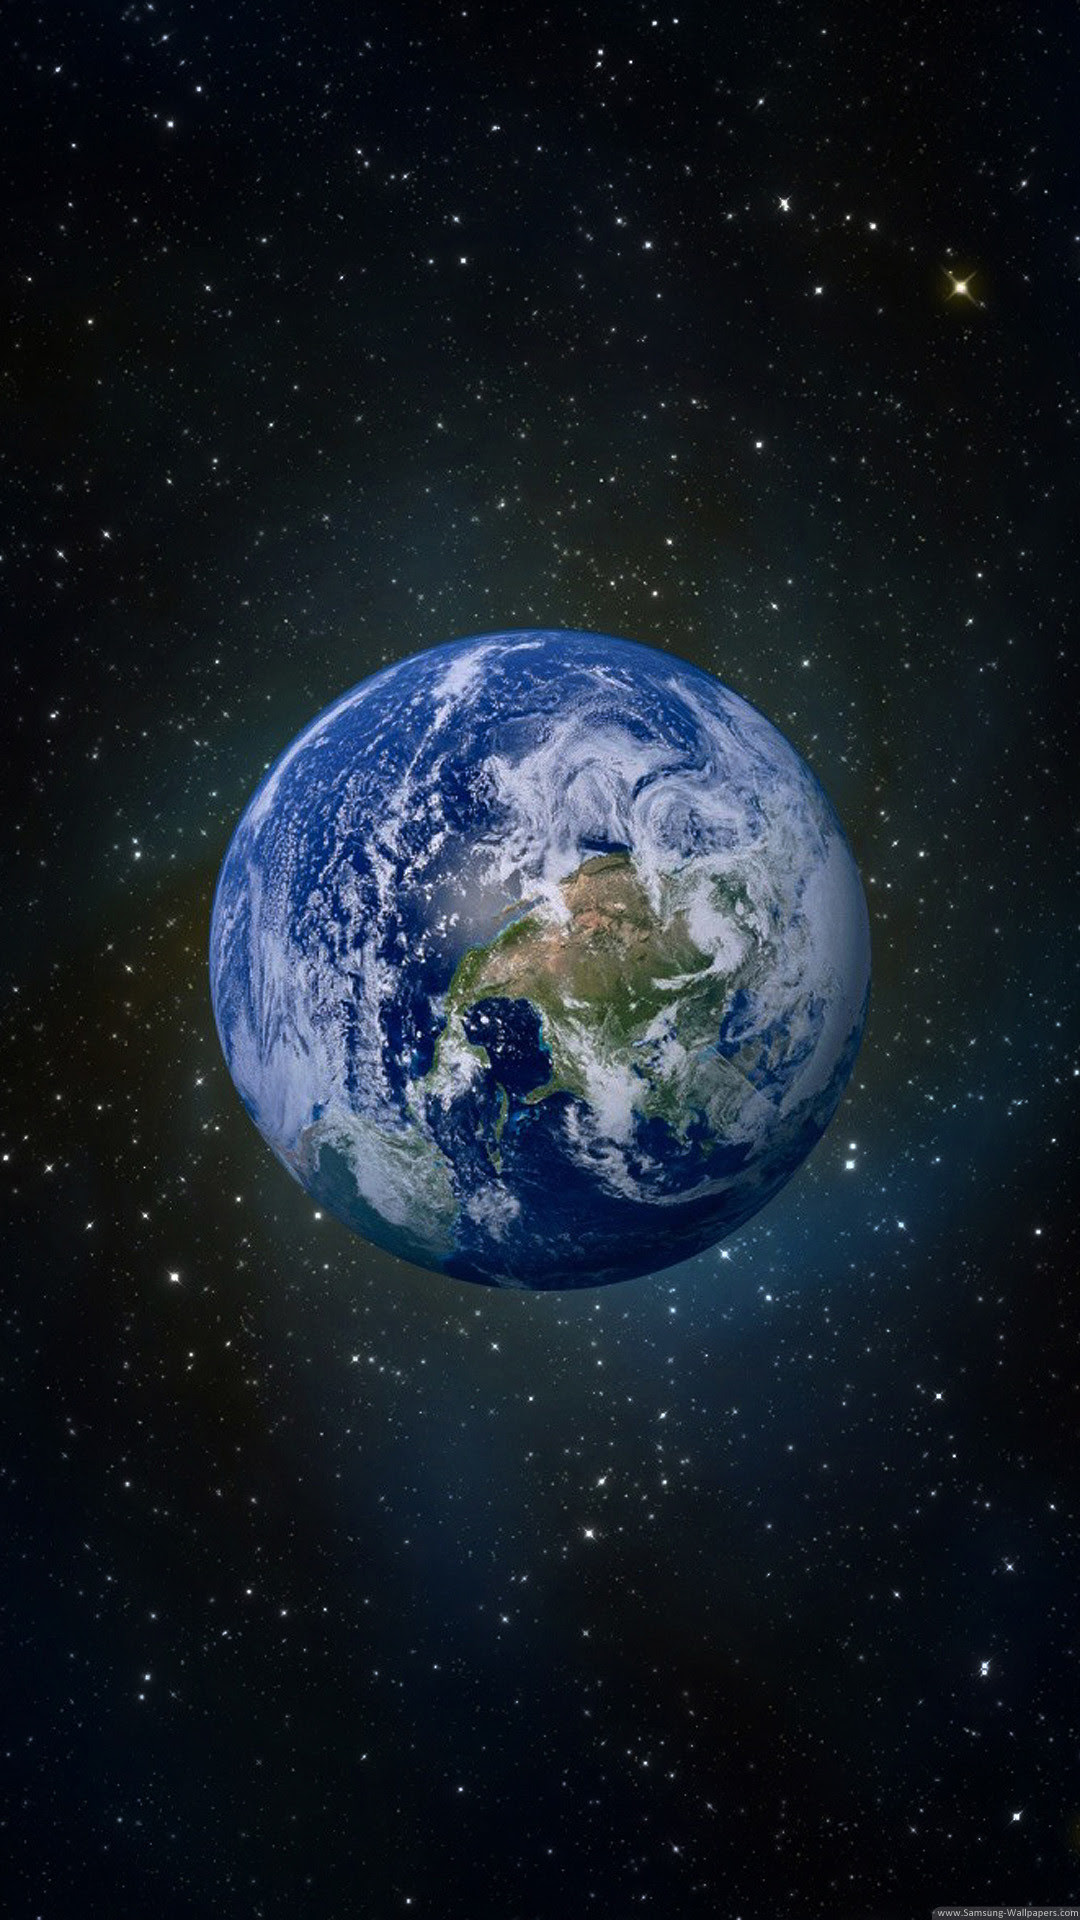 600+ Wallpaper Iphone Earth Hd HD Gratis